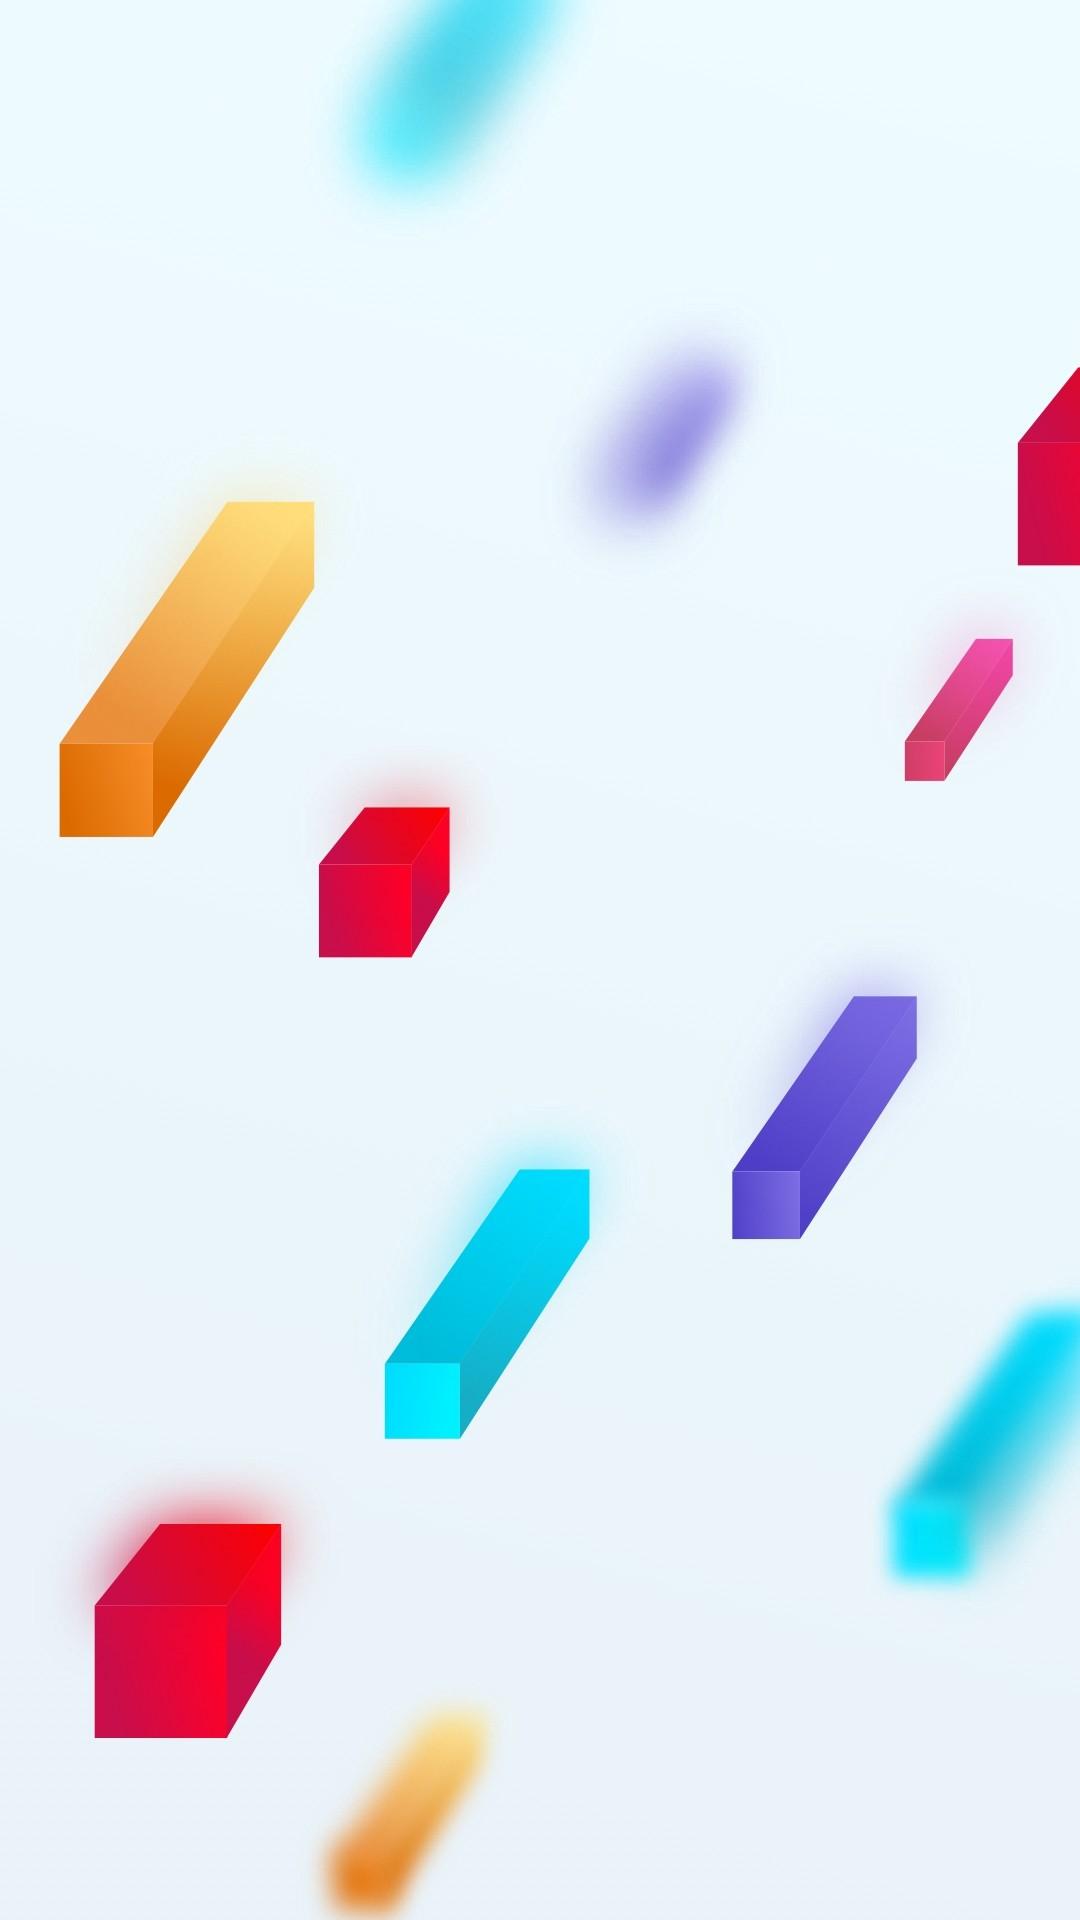 Logic iPhone 6 wallpaper